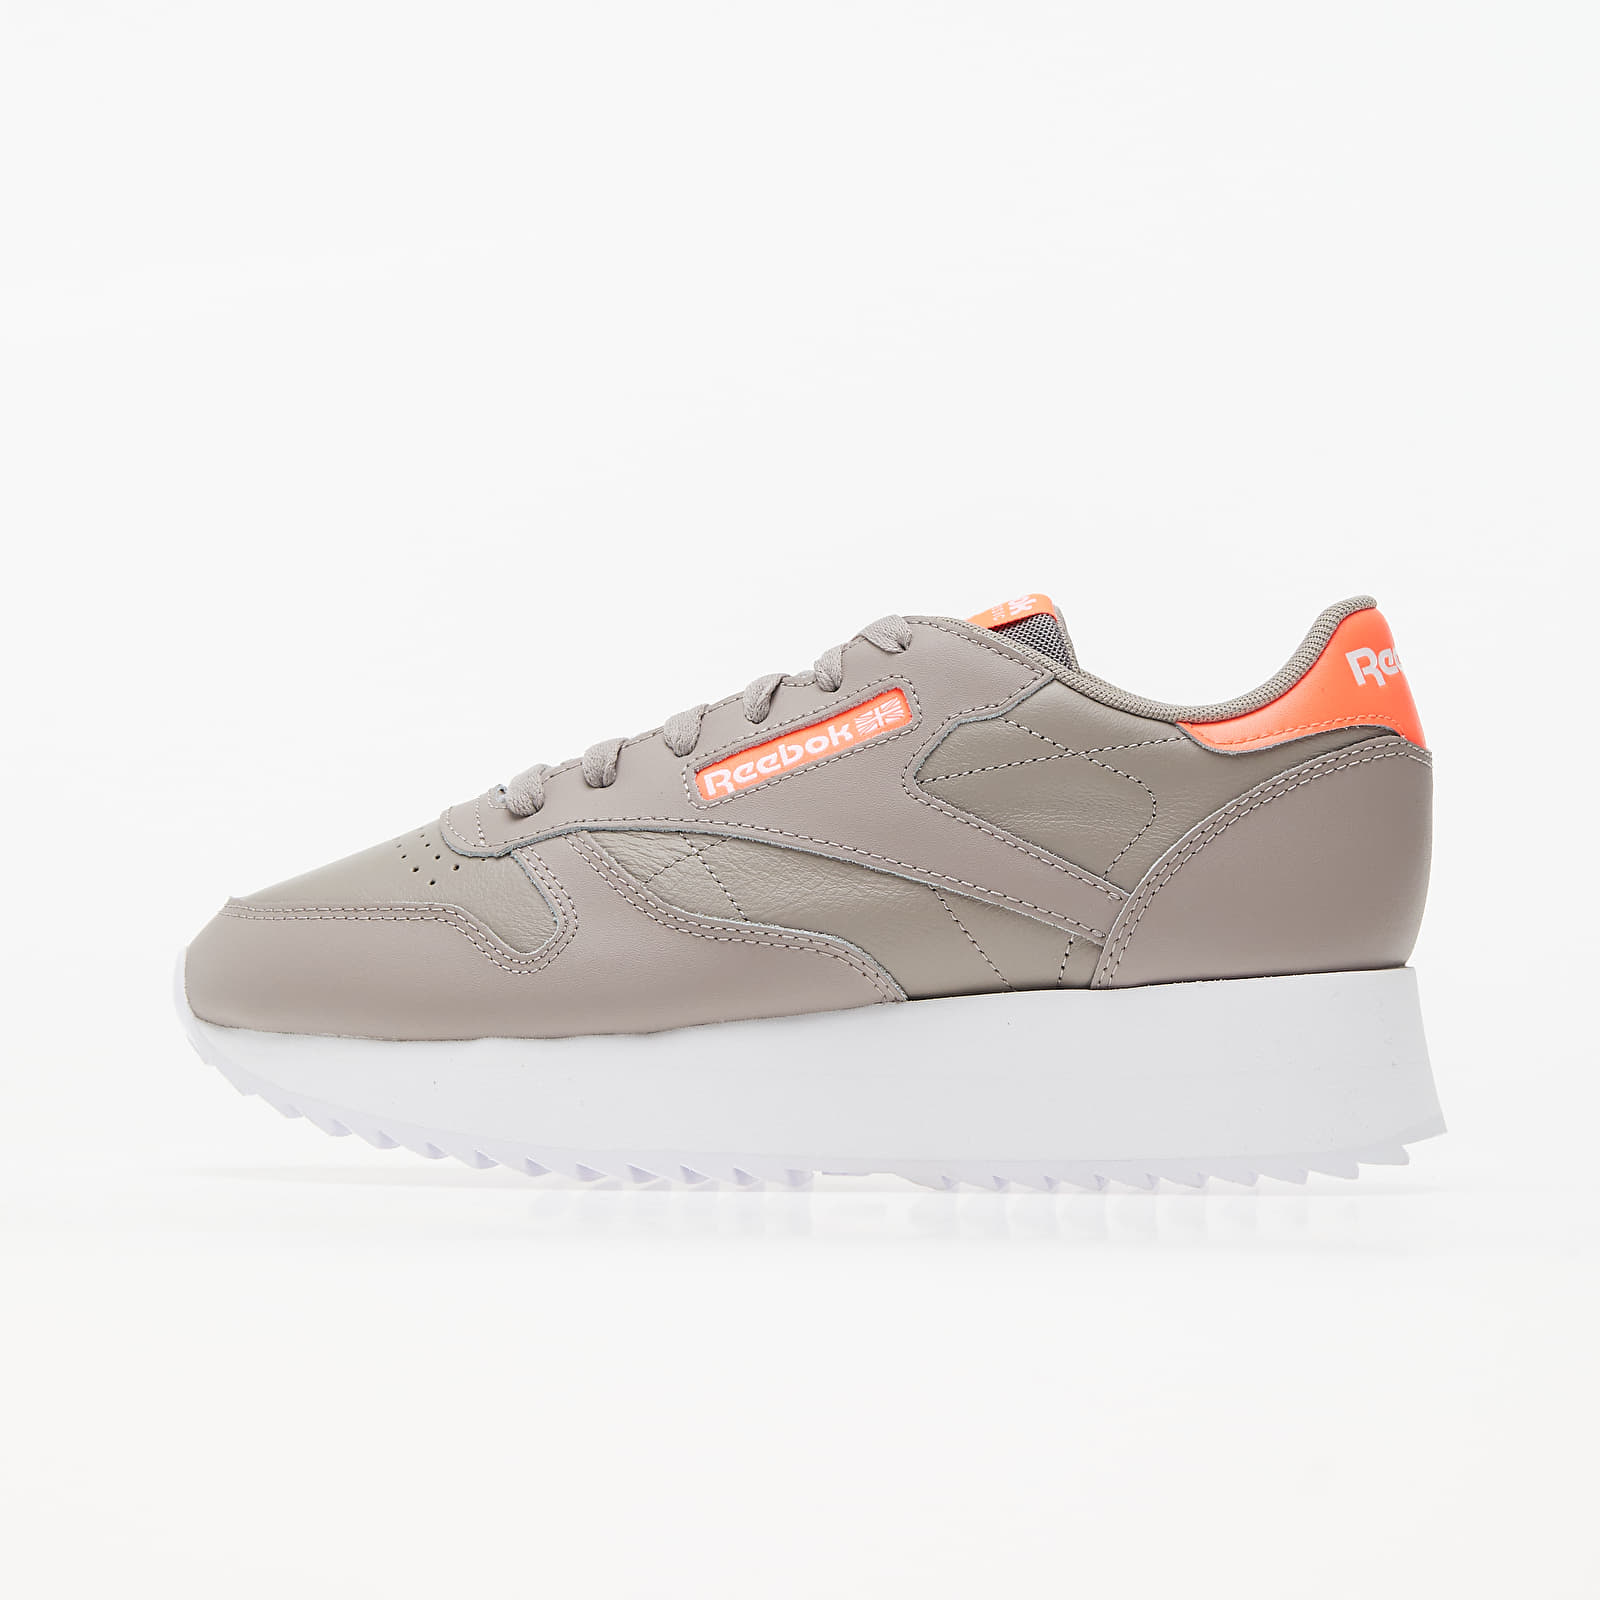 Reebok Classic Leather Double Boulder Grey/ Orange Flare / White EUR 38